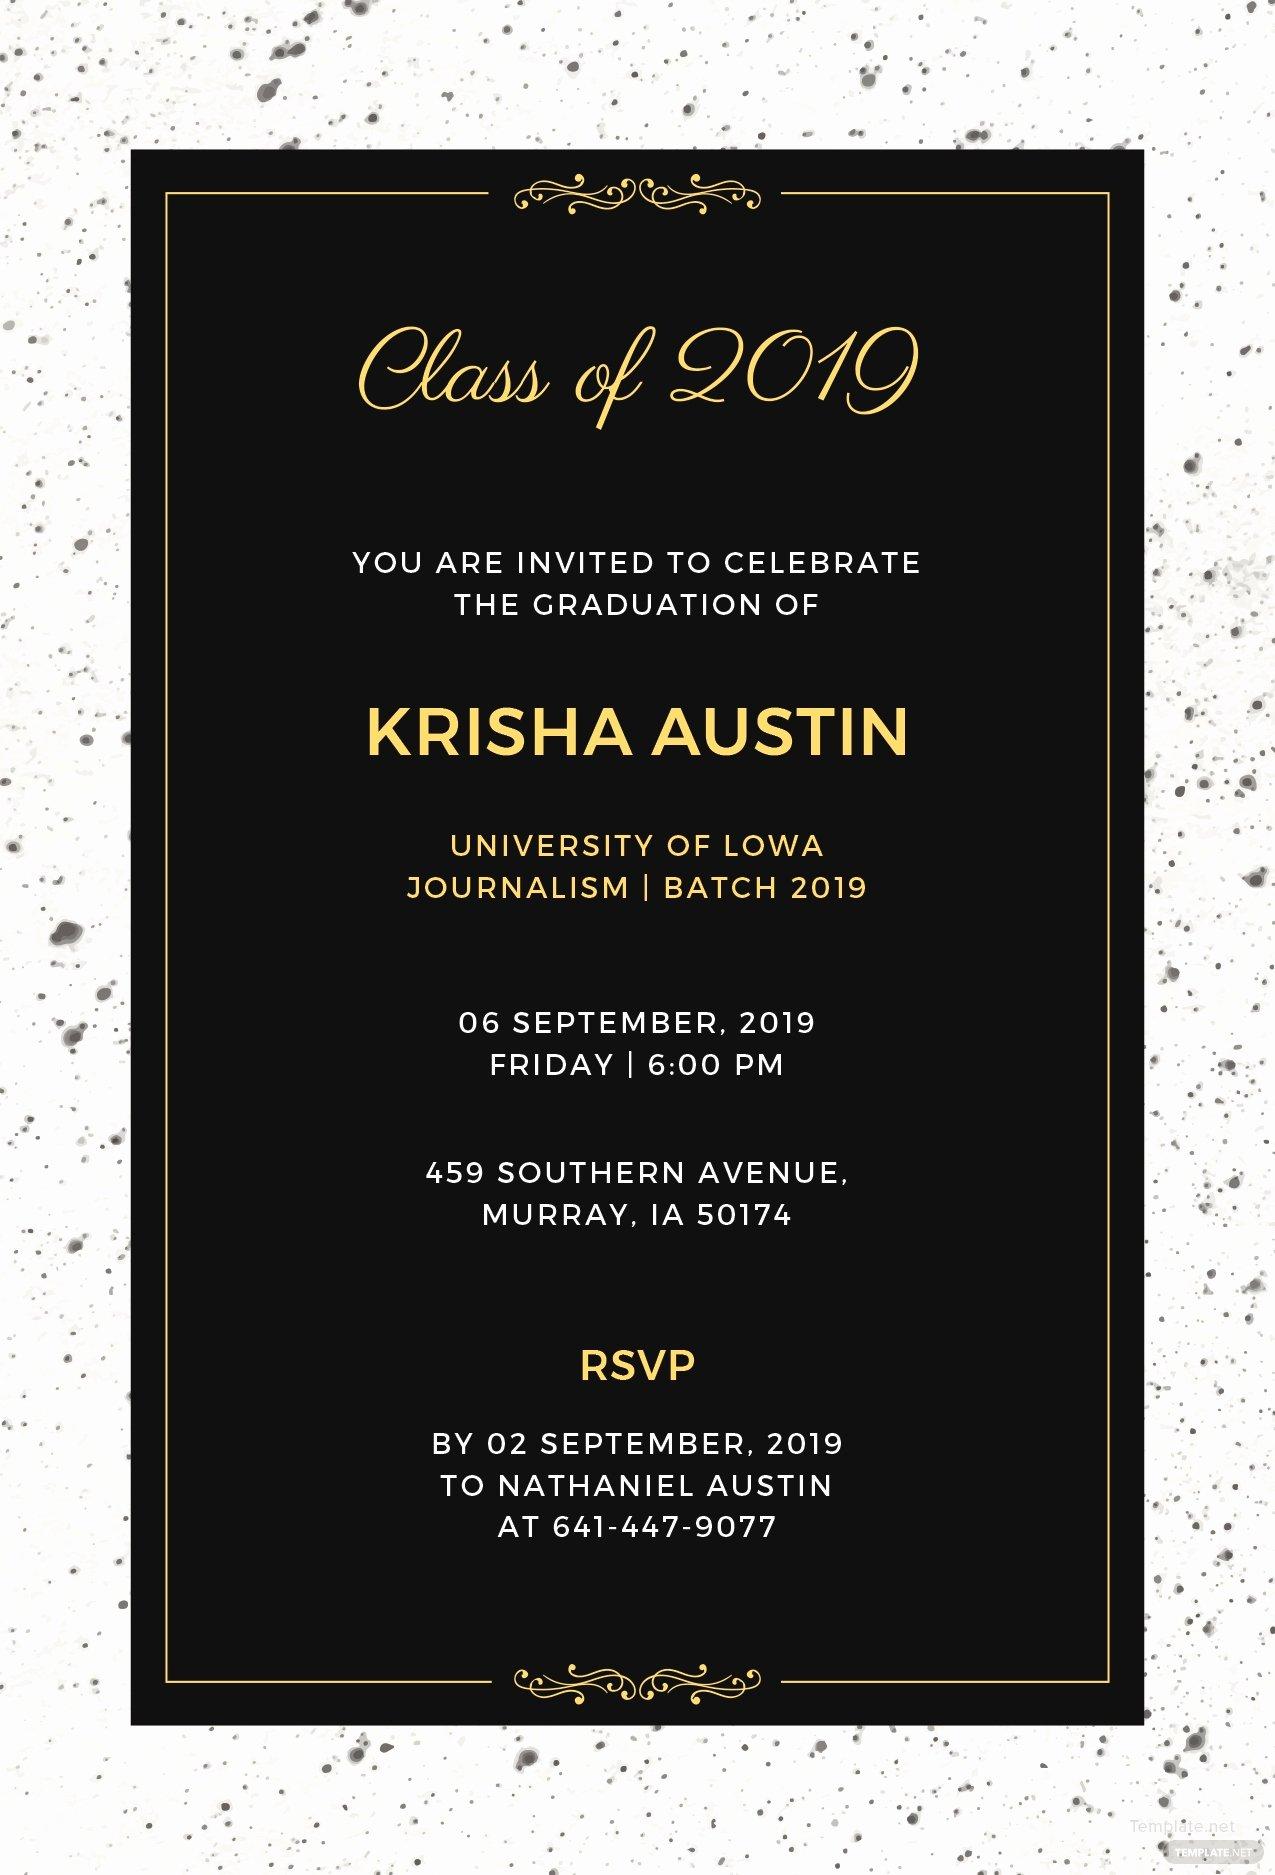 Graduation Dinner Invitation Template Unique Free Graduation Announcement Invitation Template In